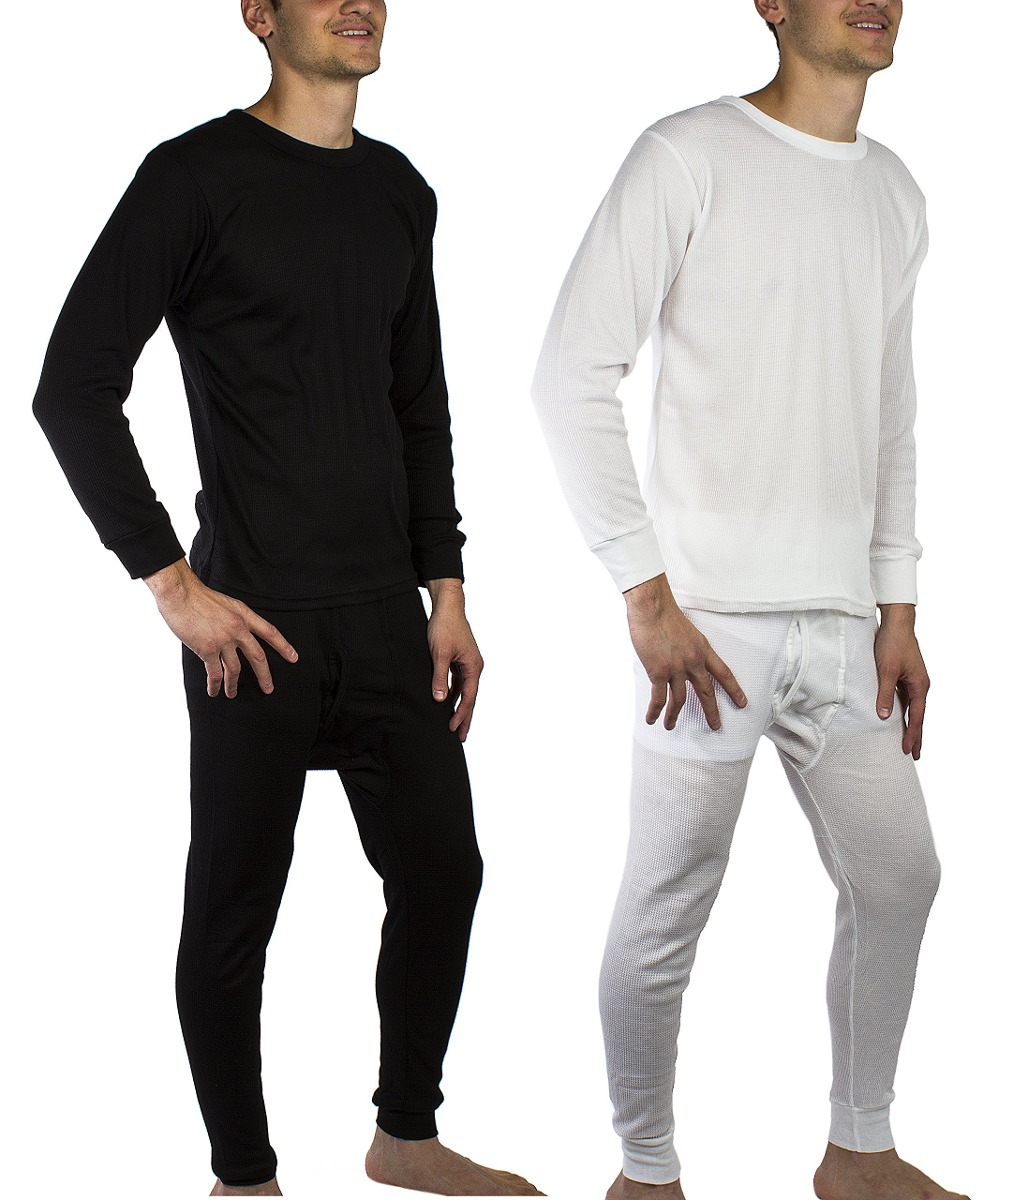 7e43199b2 jotw 2 conjuntos de ropa interior térmica para hombres co. Cargando zoom.